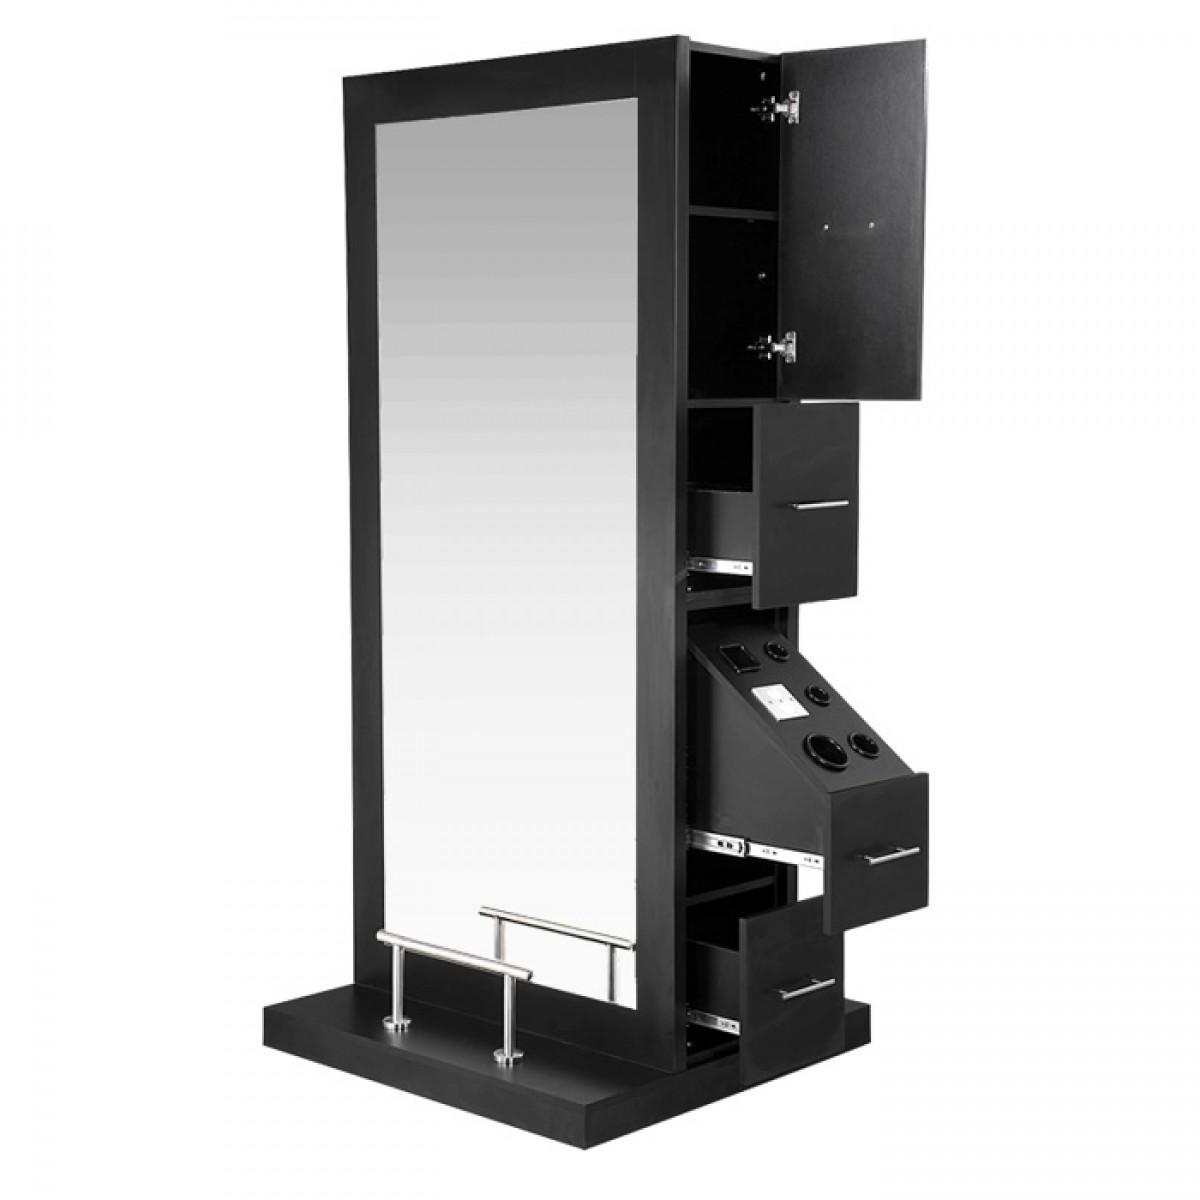 Crete Double Sided Salon Station Salon Equipment Salon Furniture